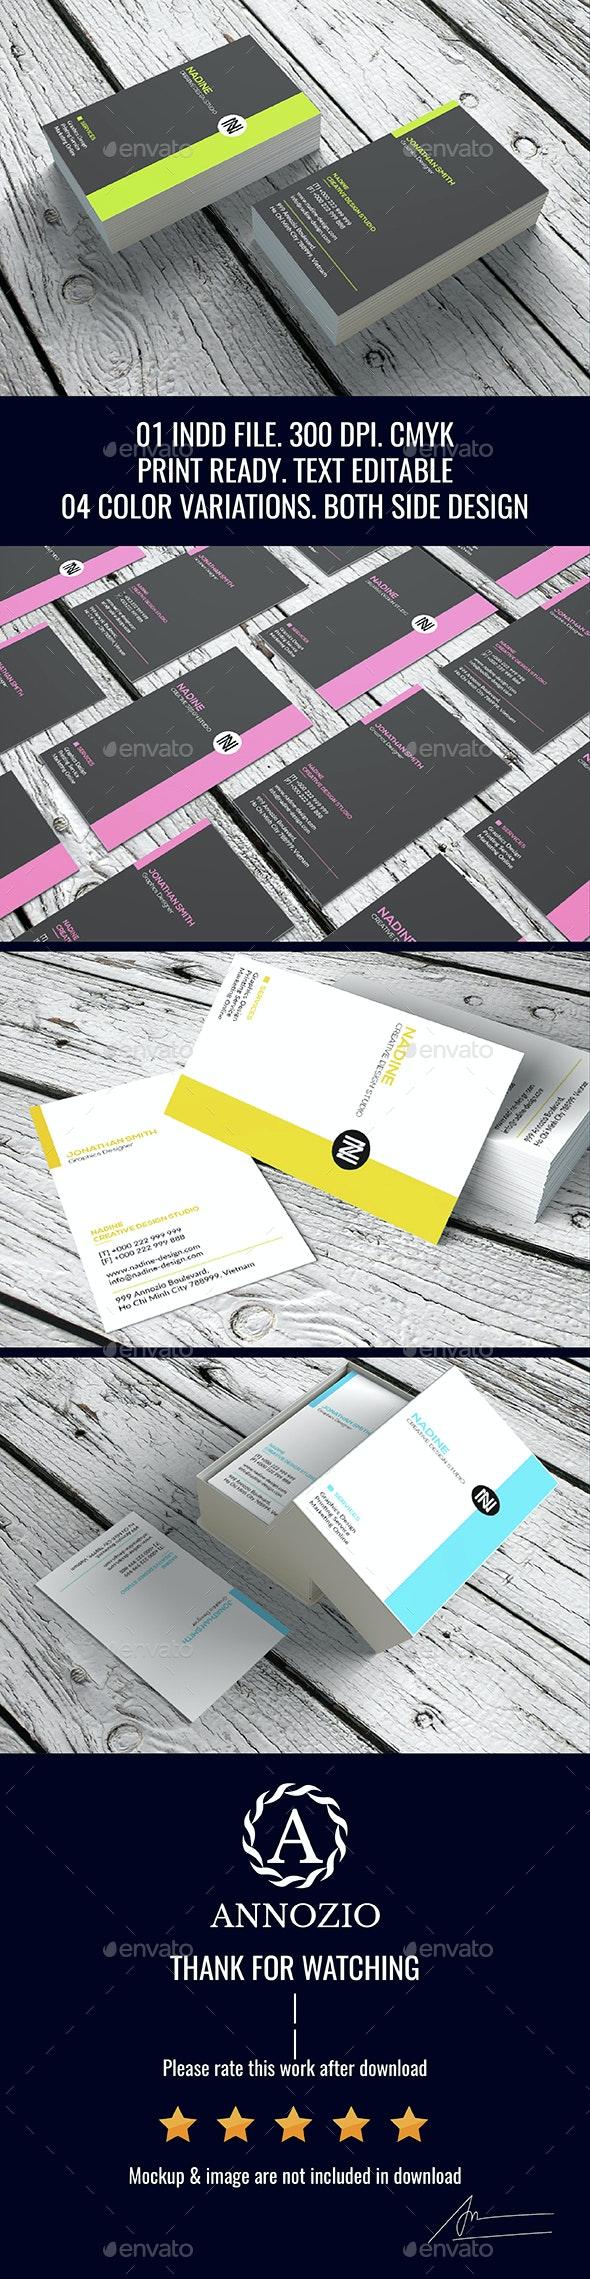 Minimal Business Card InDesign 0016 - Creative Business Cards